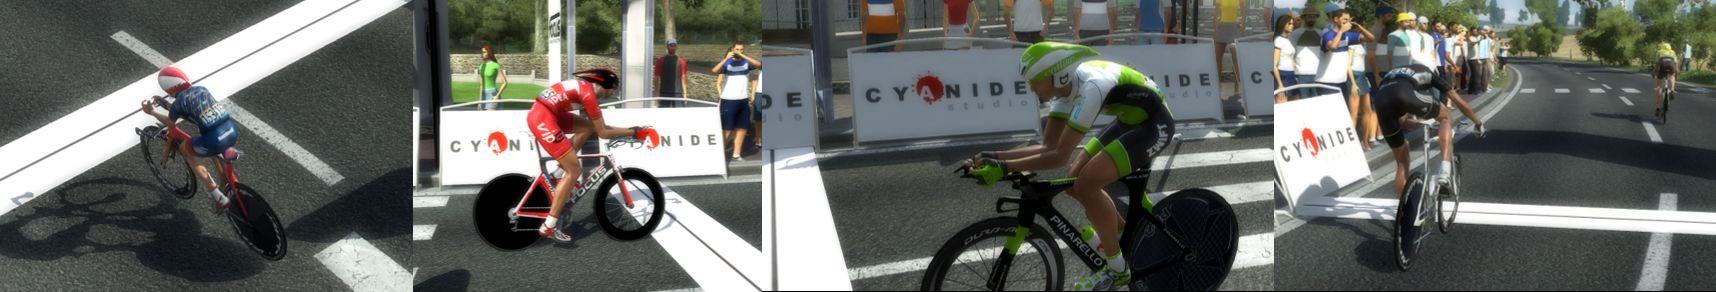 pcmdaily.com/images/mg/2019/Races/C1/Bayern/S4/mg19_bay_s04_19.jpg